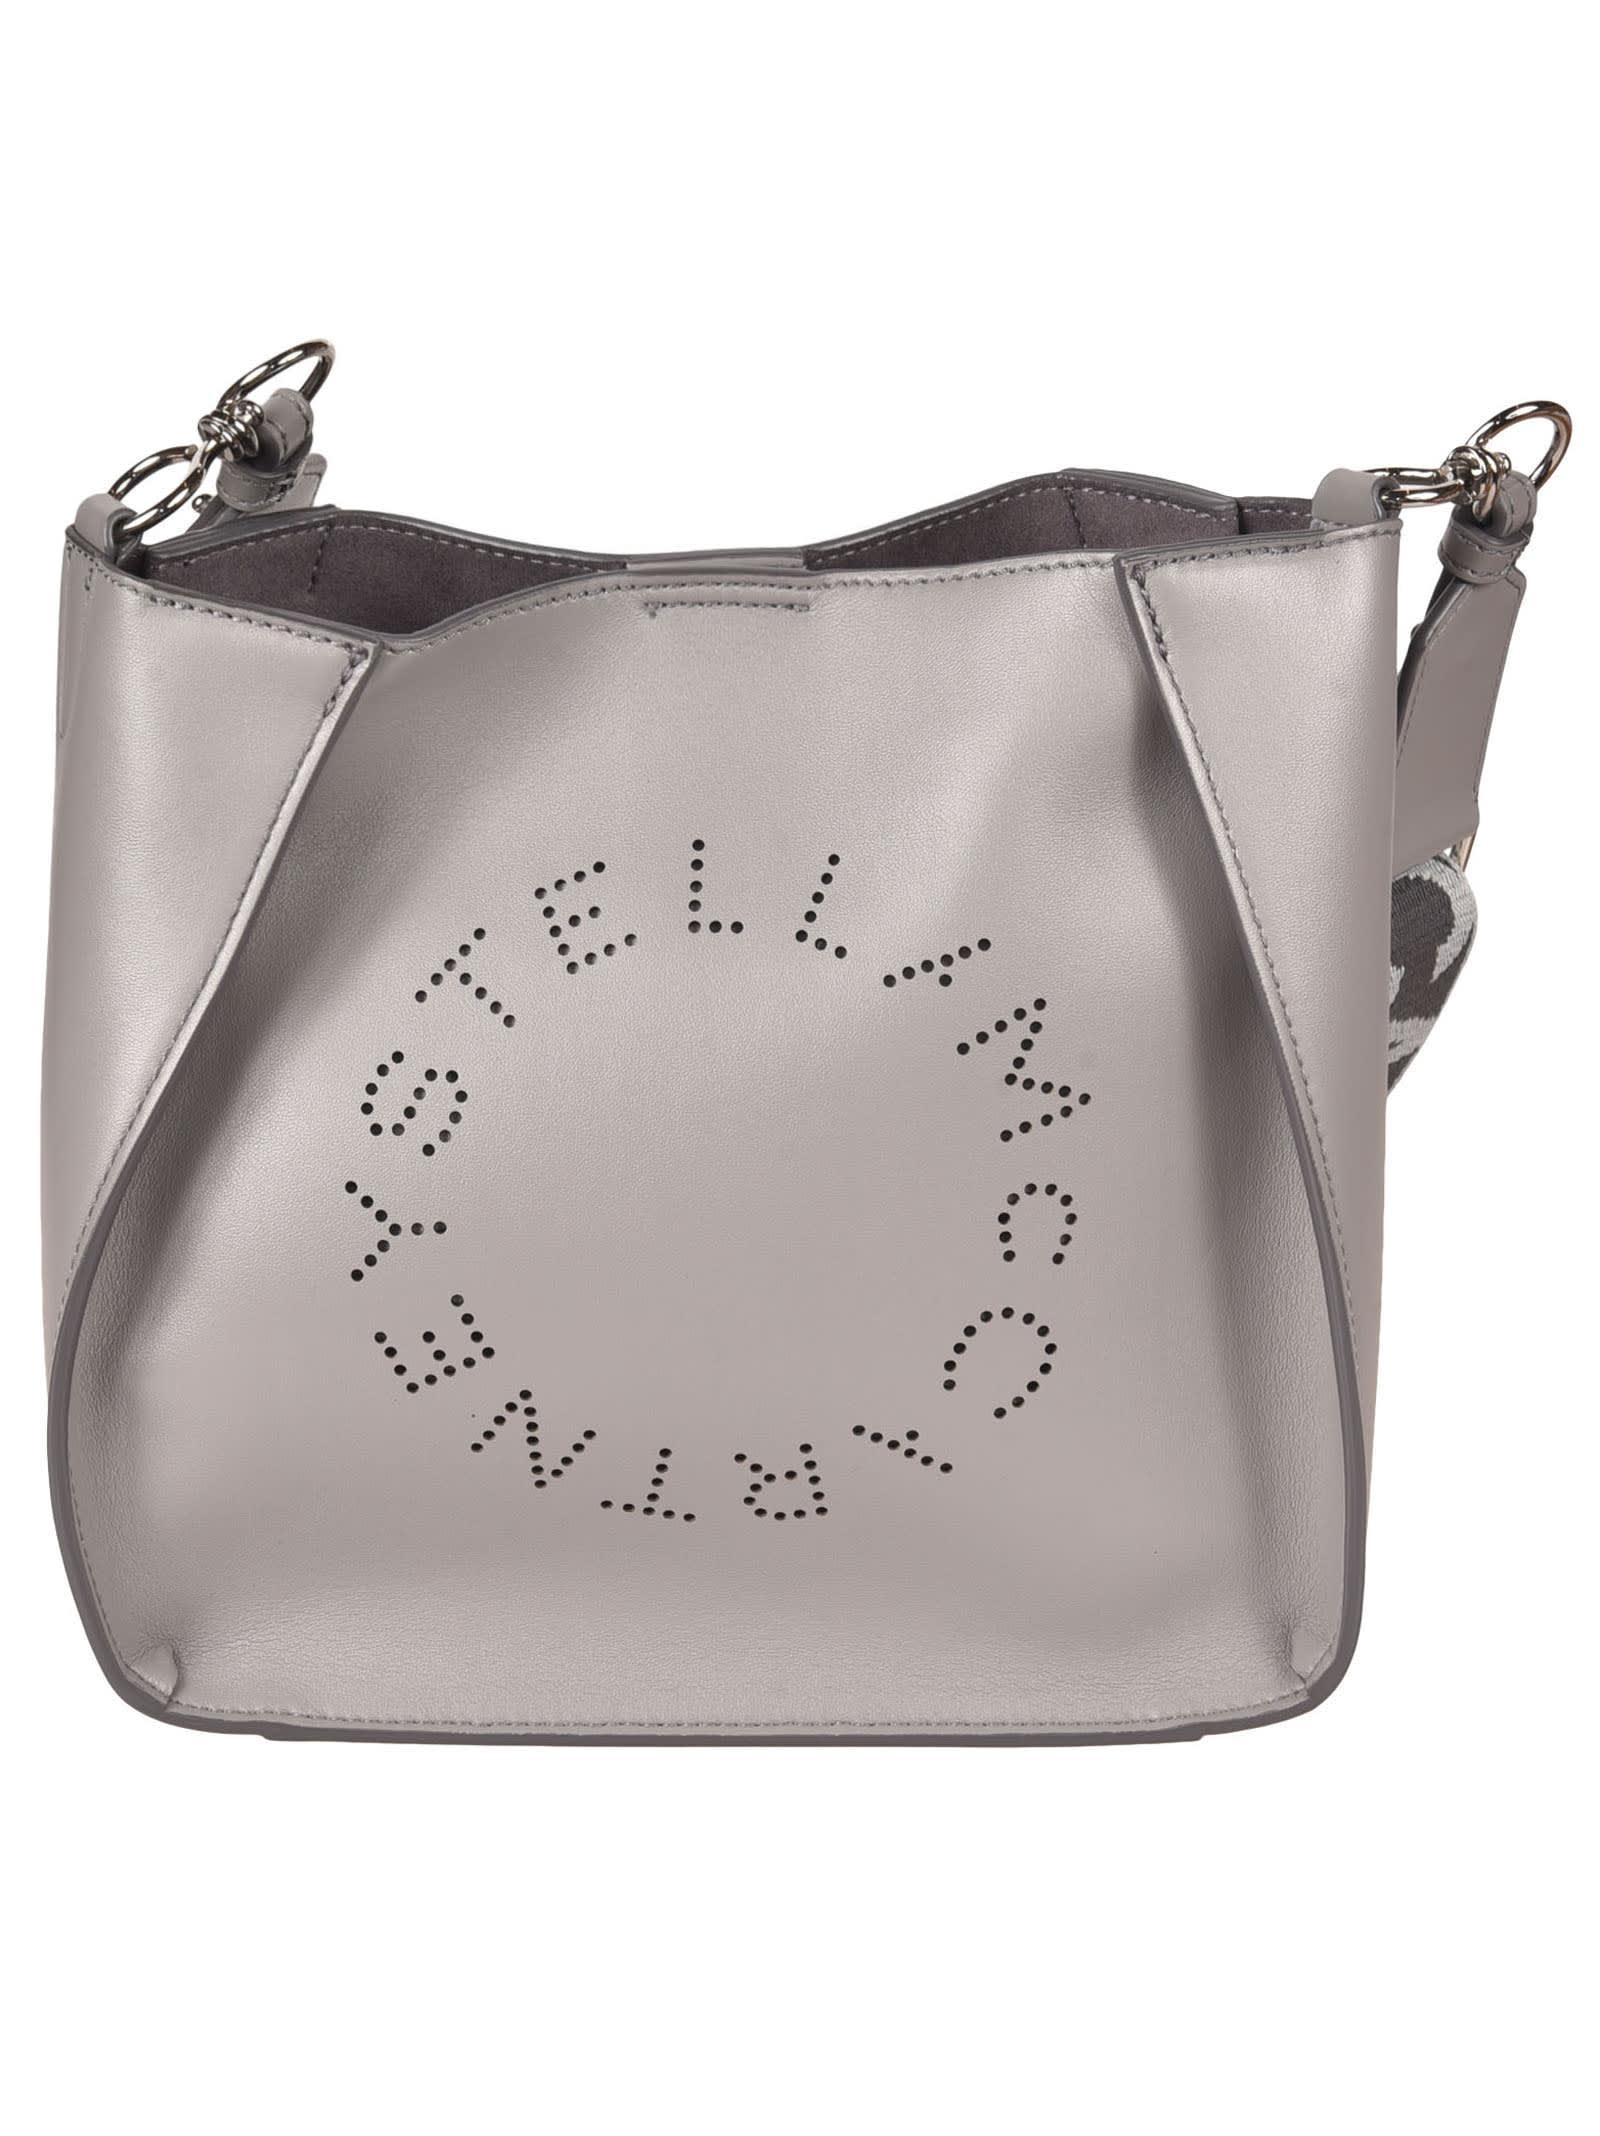 Stella Mccartney Mini Logo Crossbody Bag In Smoke